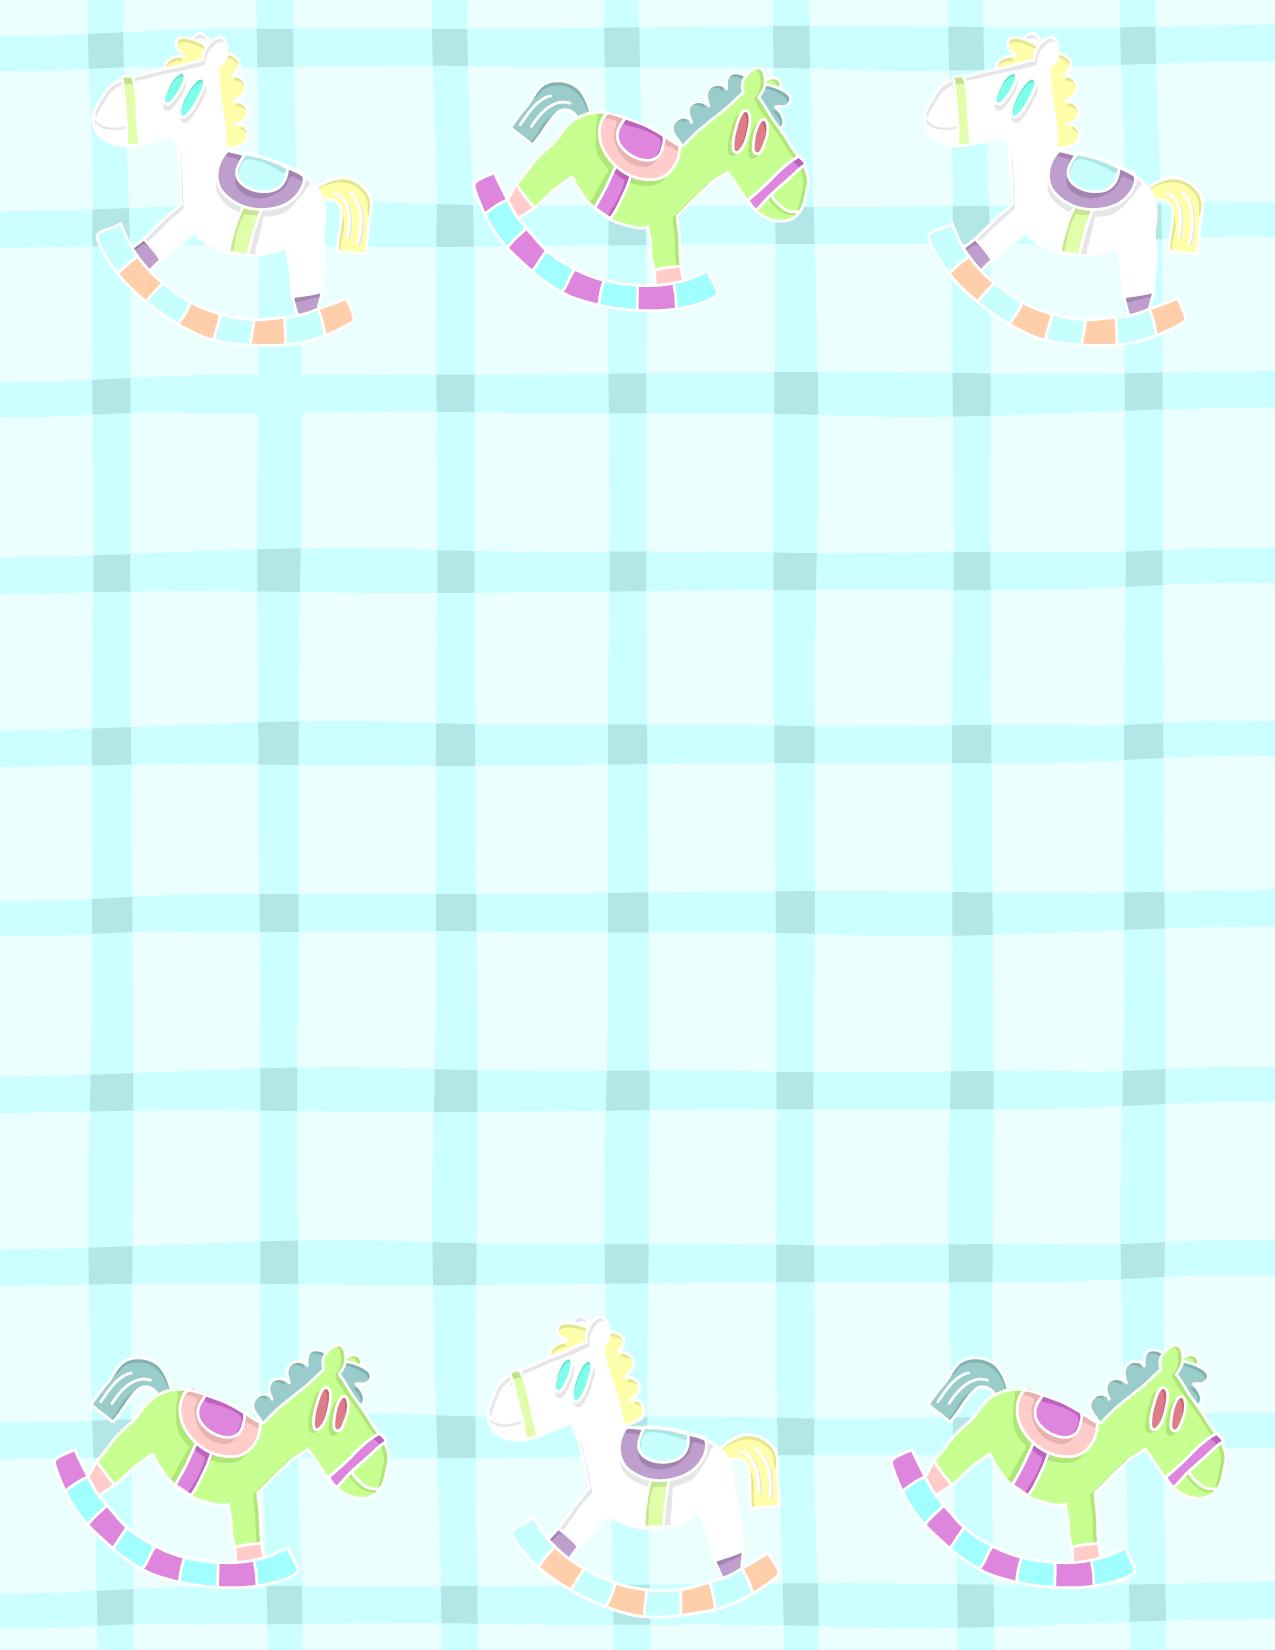 Scrapbook Templates Printable. Breast Cancer Scrapbook Layout 2 - Baby Scrapbook Templates Free Printable